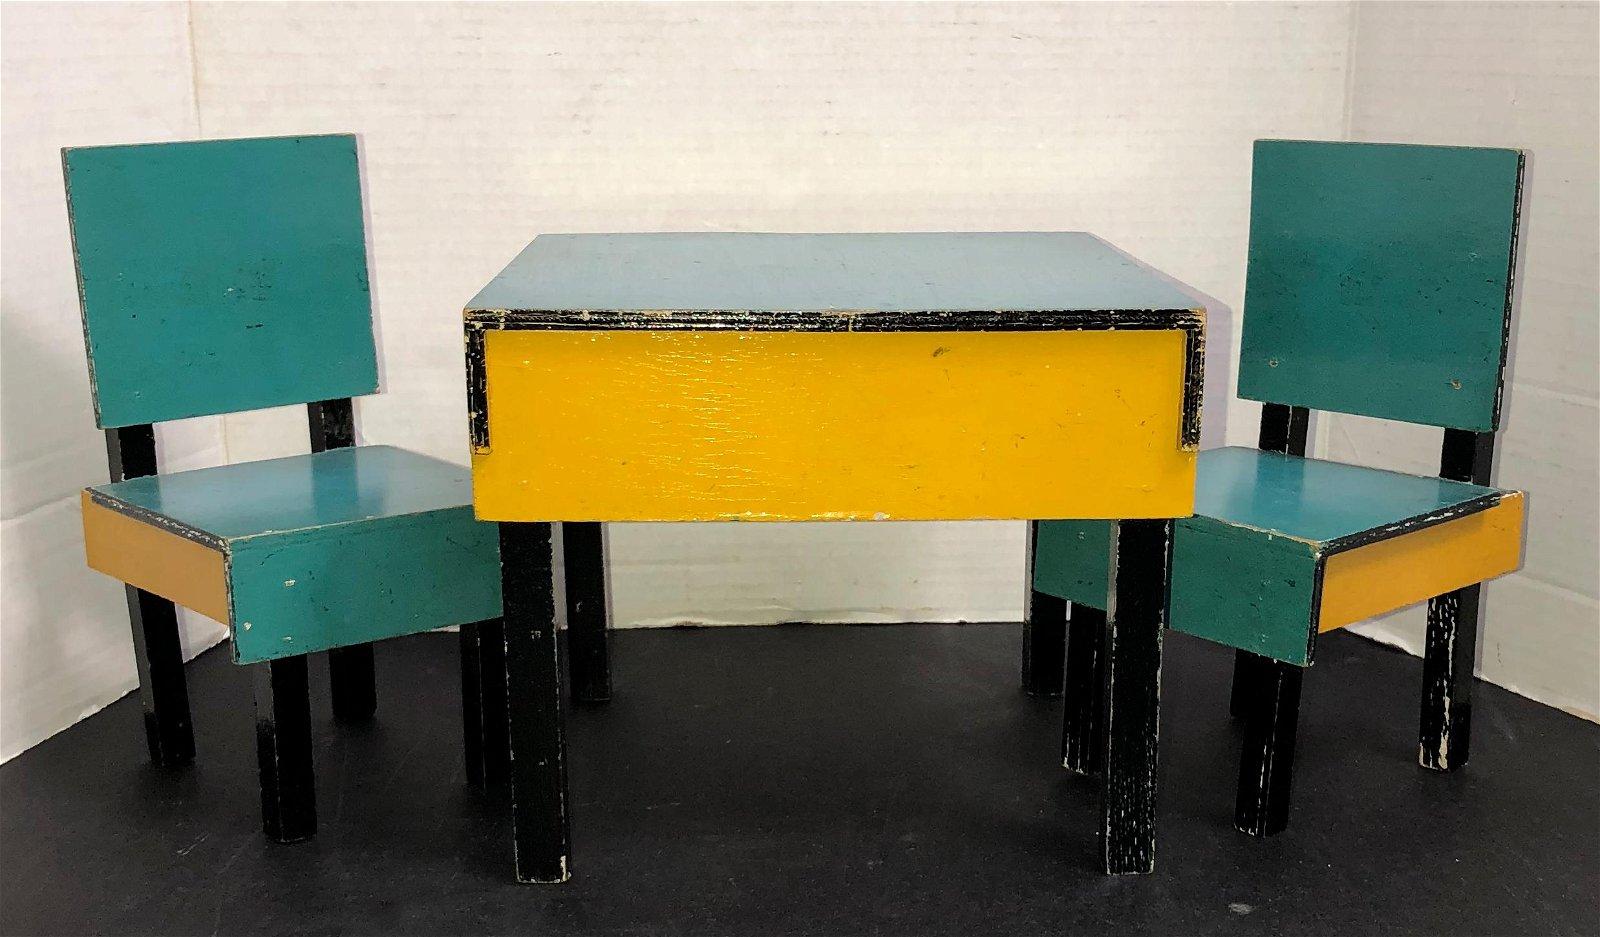 Ado Ko Verzuu Chairs & Table Holland 1925